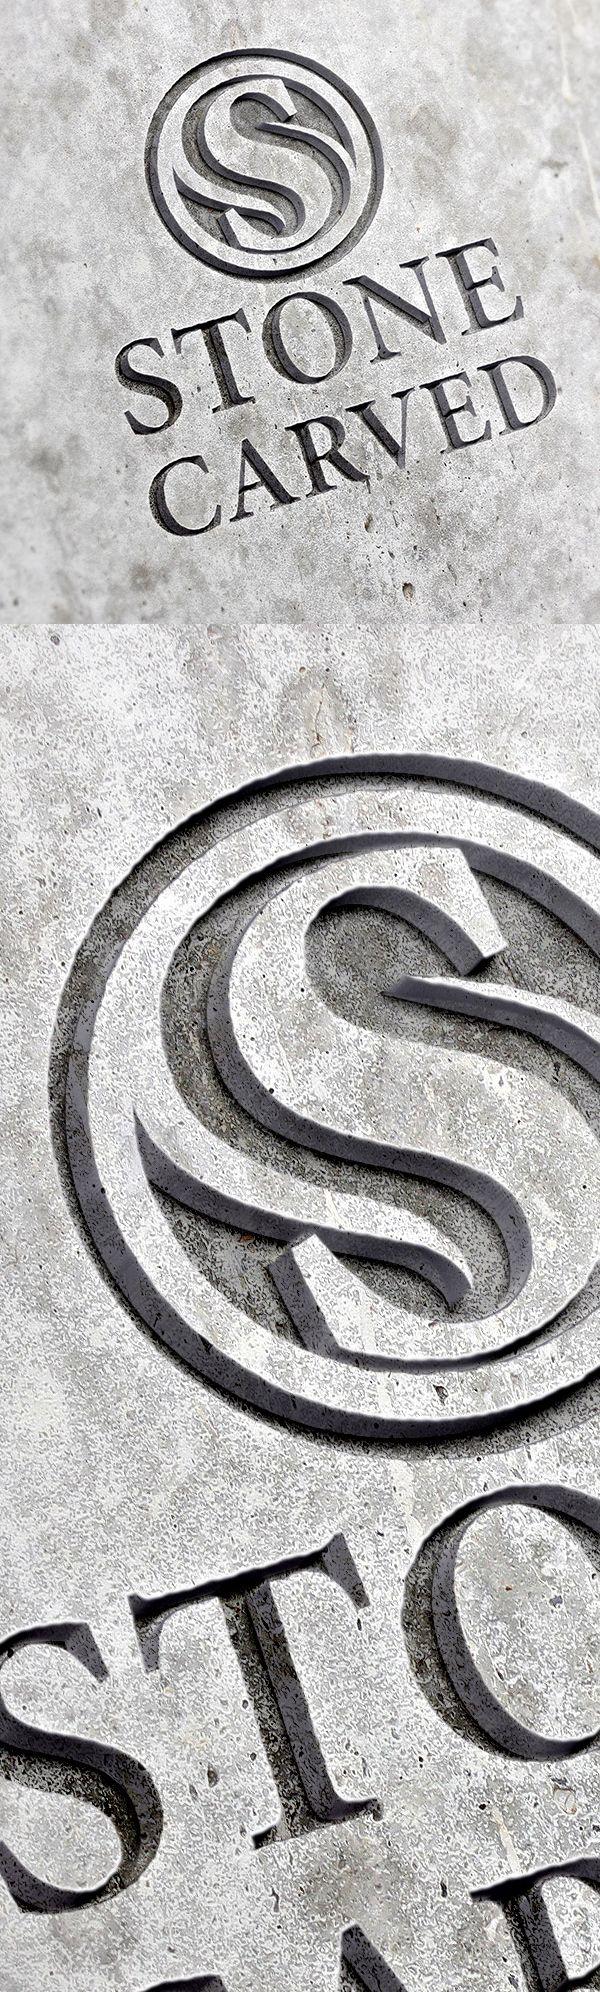 Free Carved Stone Logo Mockup PSD #freepsdfiles #freebies #freepsdmockup #psdmockup #mockuptemplate #freedownload